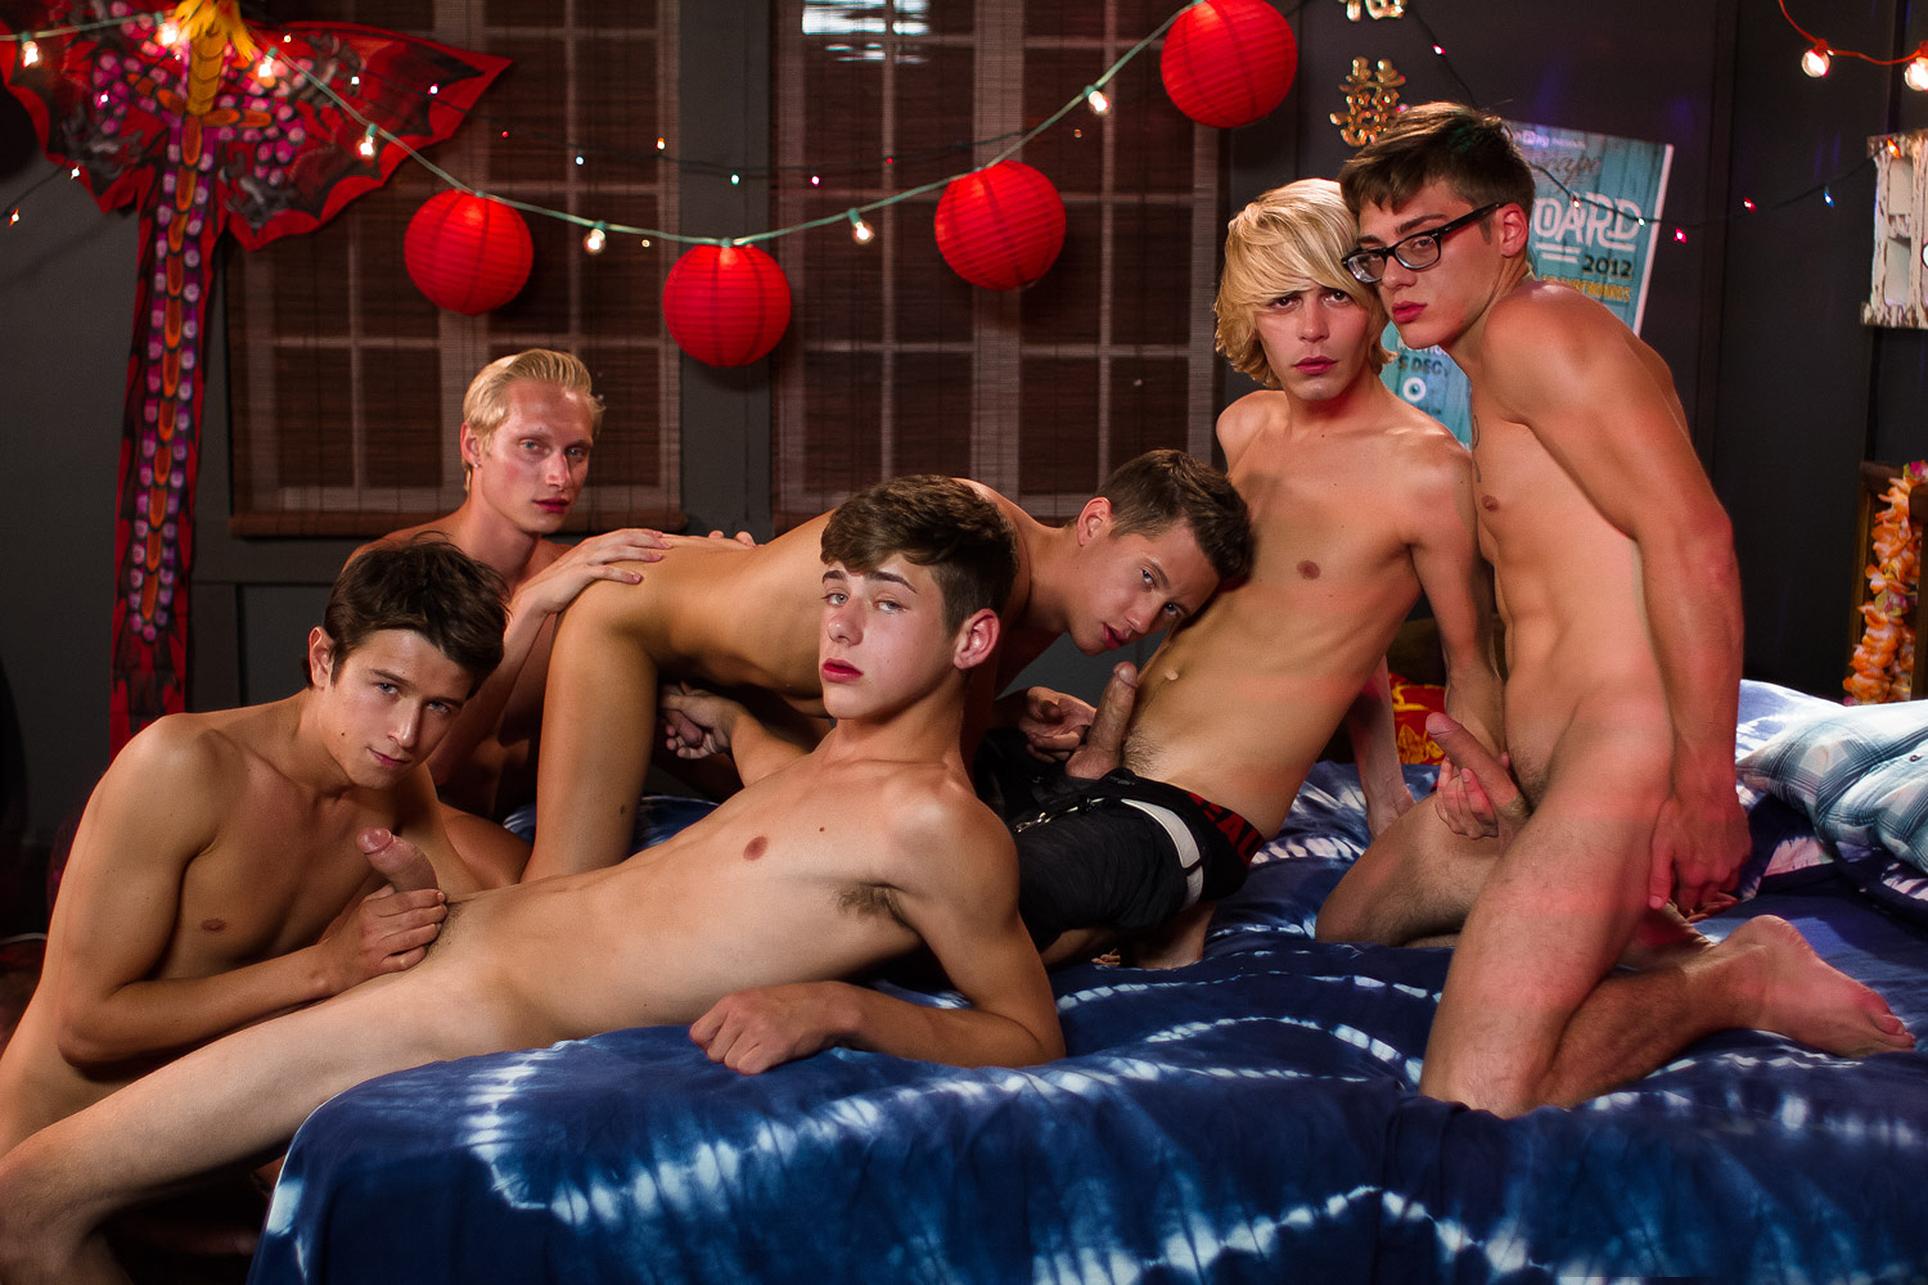 Dominican boys in outdoor sex orgy